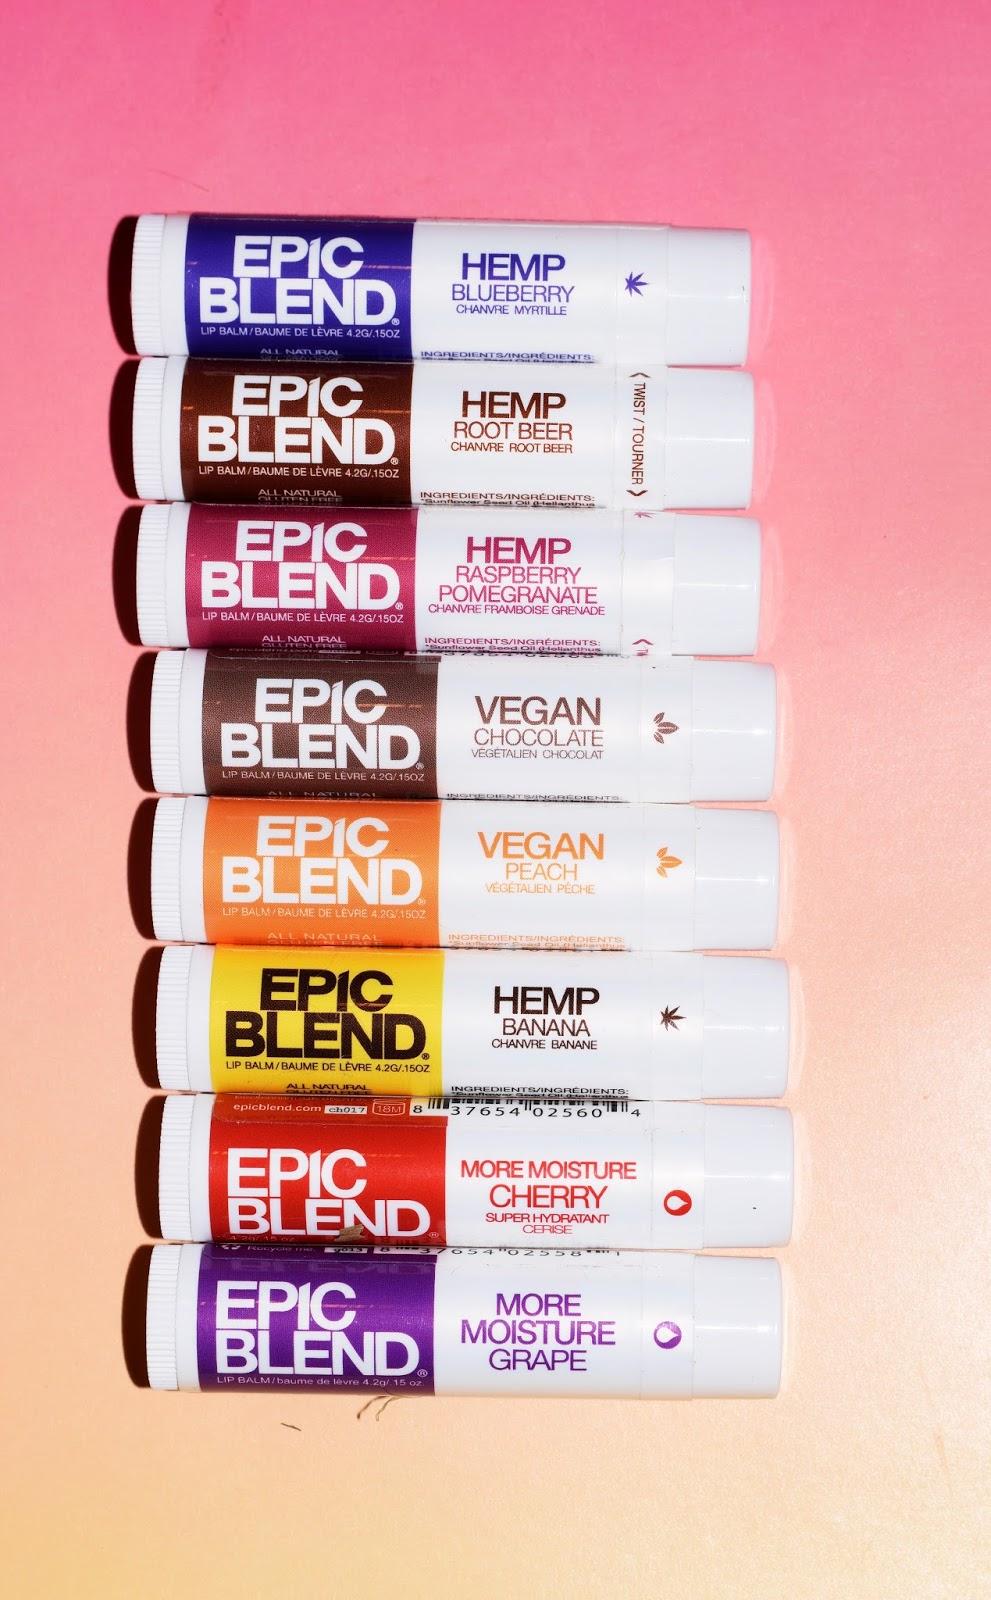 chapped lips, dry lips, lip treatment, epic balm, lip balm, smooth lips, lips, lip